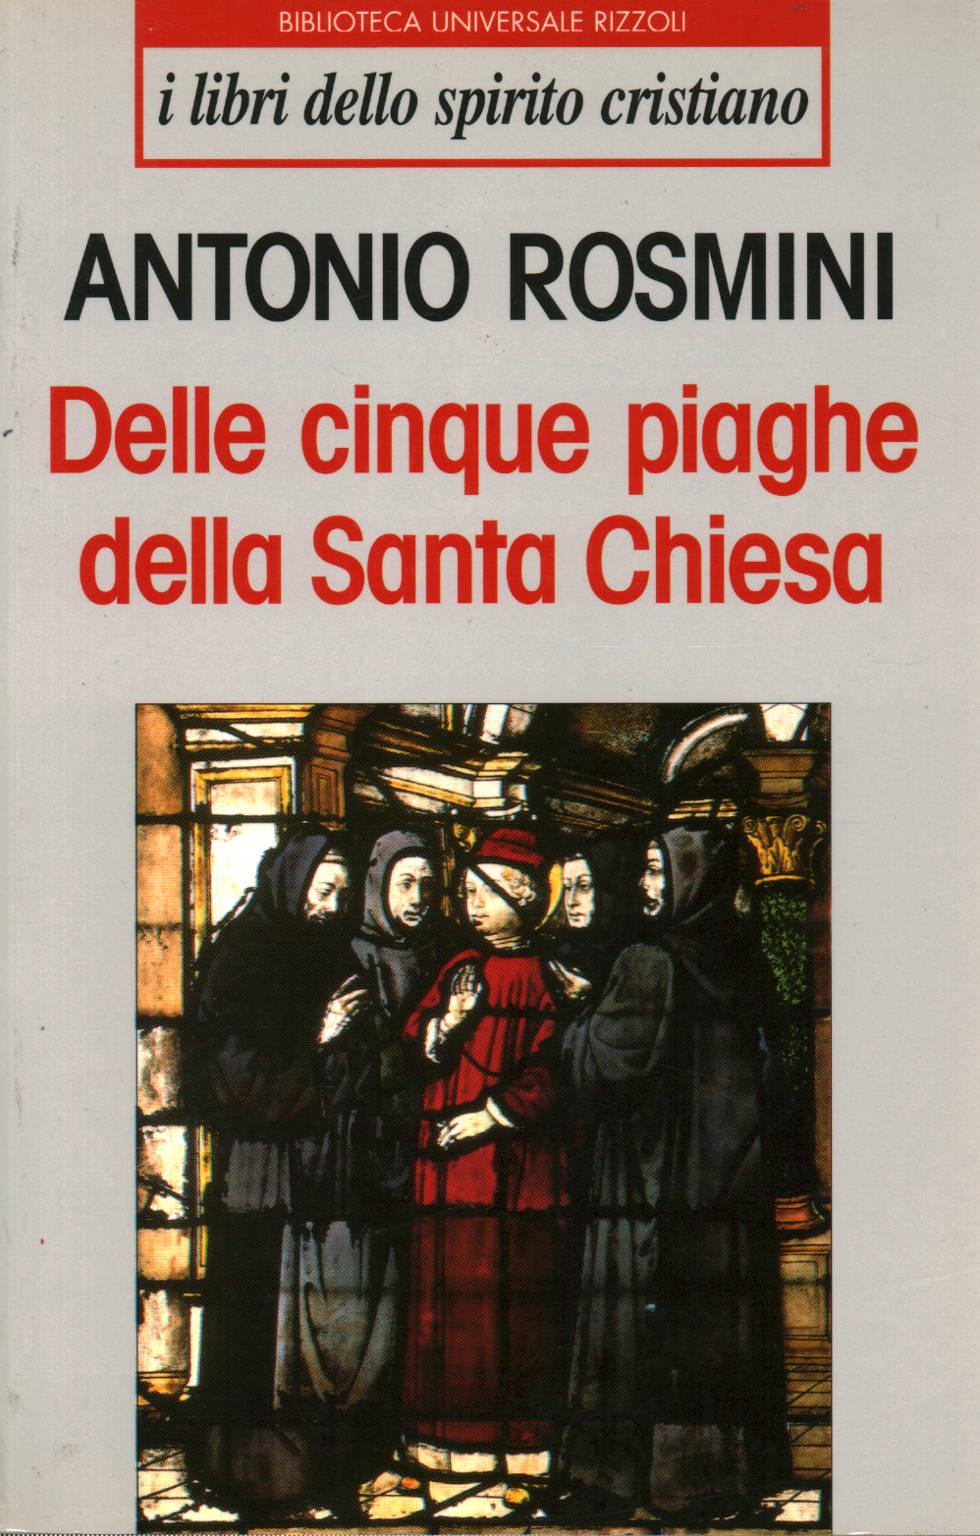 Das cinco chagas da Santa Igreja - Antonio Rosmini - O cristianismo - Religião - Biblioteca - dimanoinmano.it